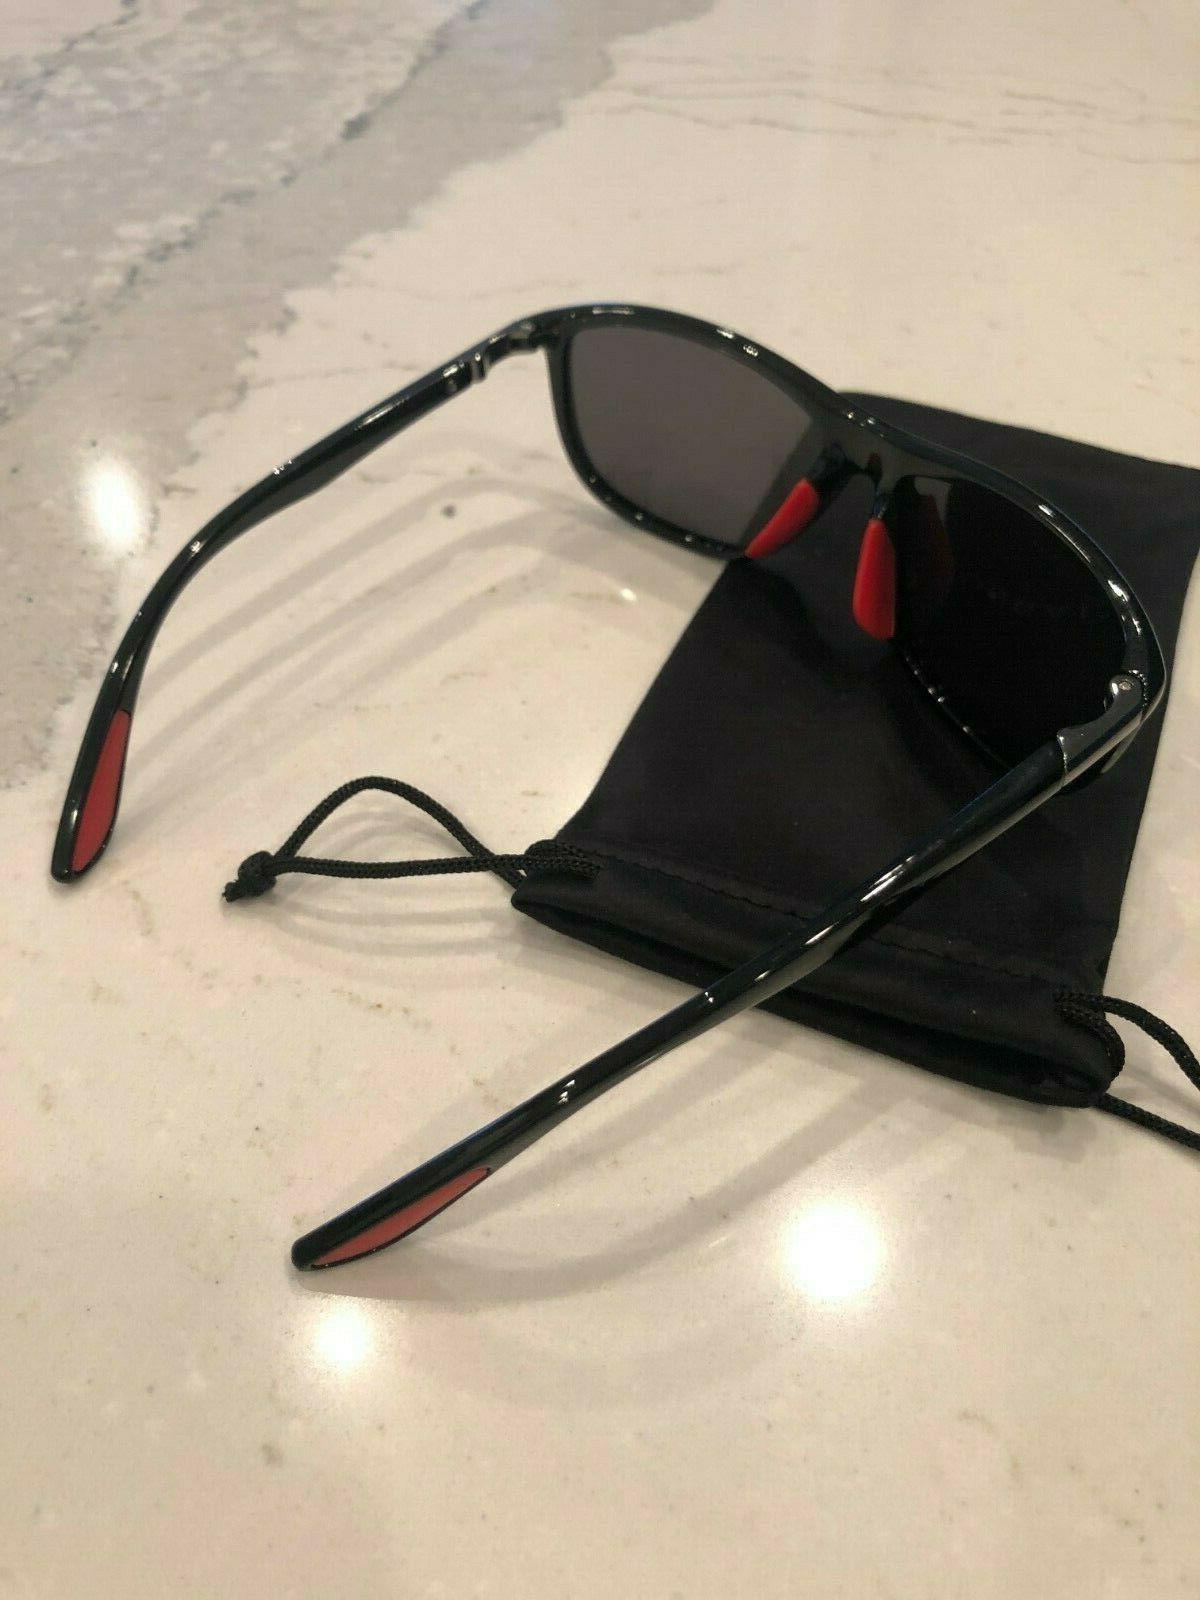 SUNGAIT Unisex Polarized Sunglasses Fashion Sun NEW + accessories